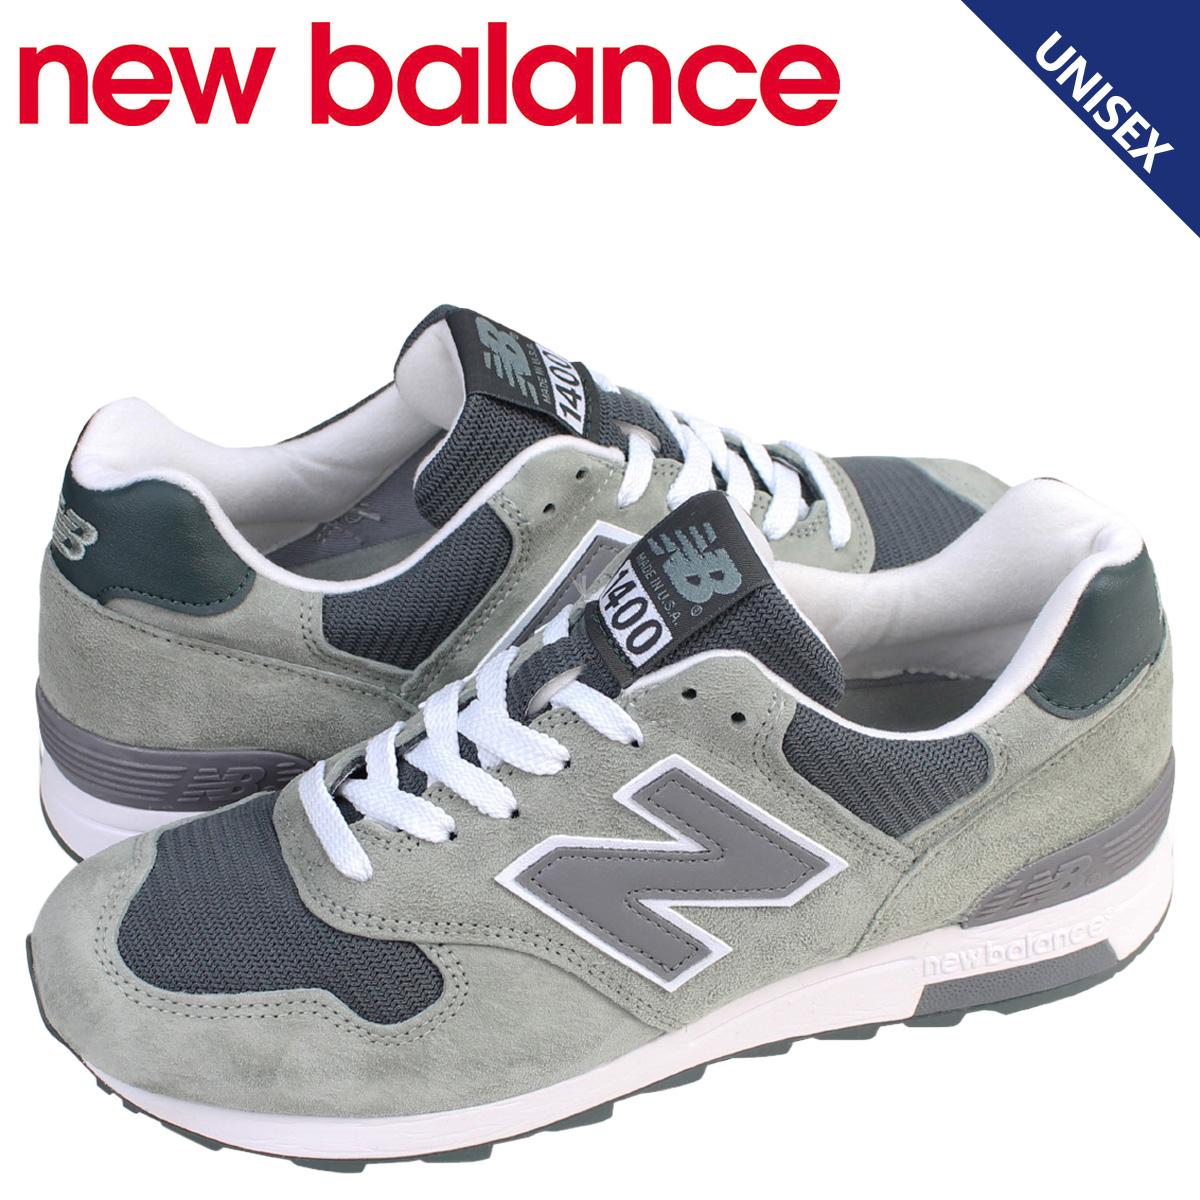 new style f7da7 c8829 new balance 1400 M1400CSP New Balance men gap Dis sneakers D Wise shoes  gray [183]